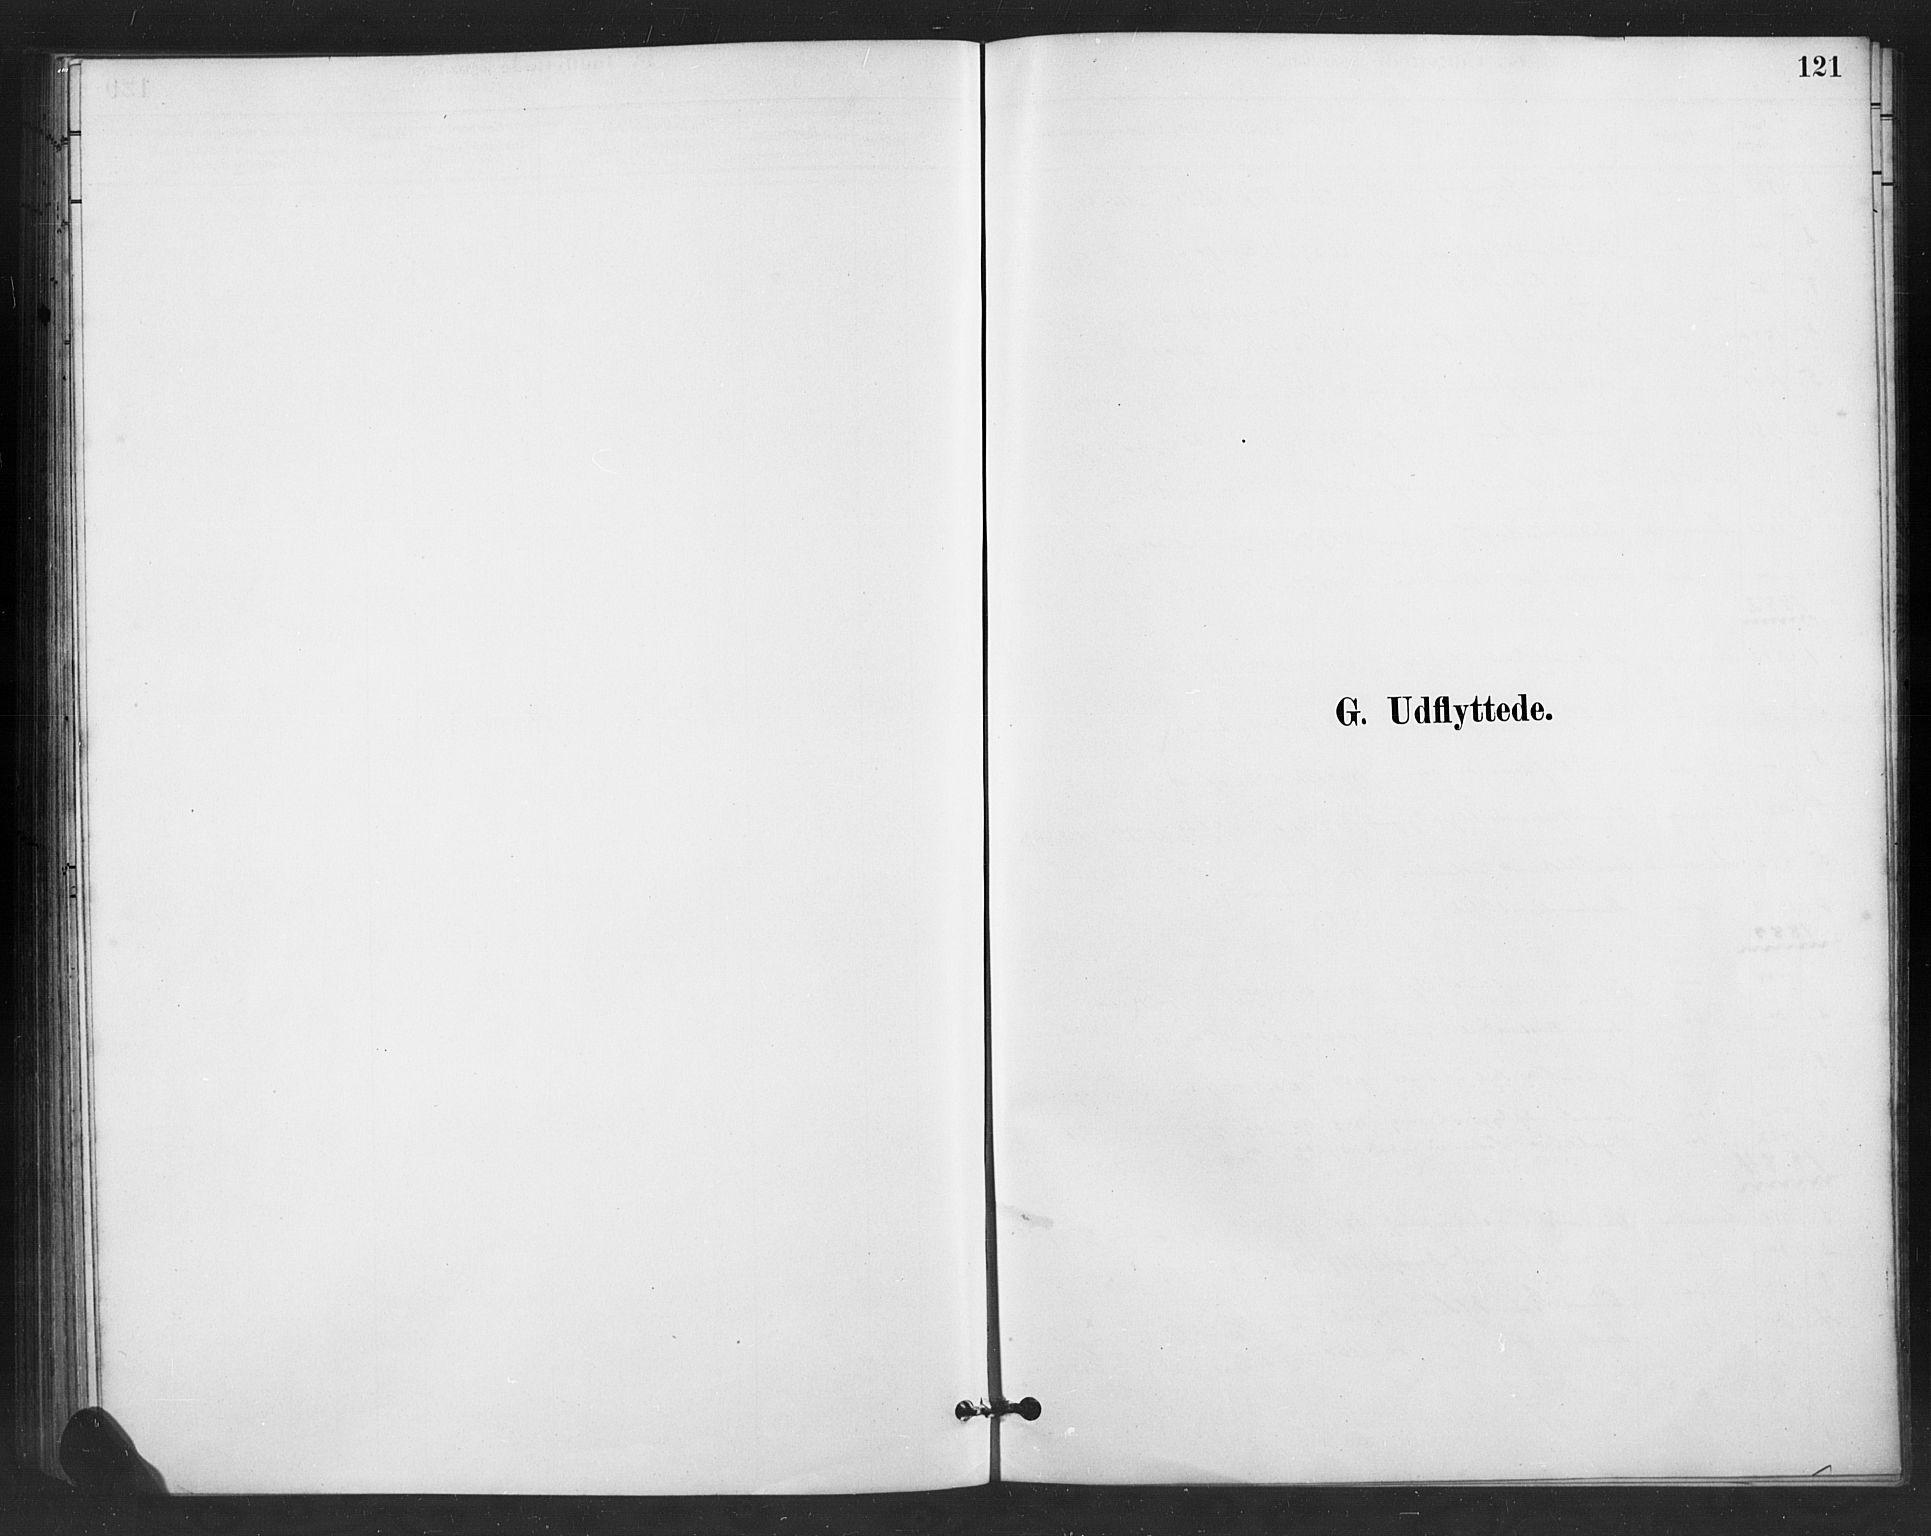 SAH, Vestre Slidre prestekontor, Klokkerbok nr. 6, 1881-1915, s. 121